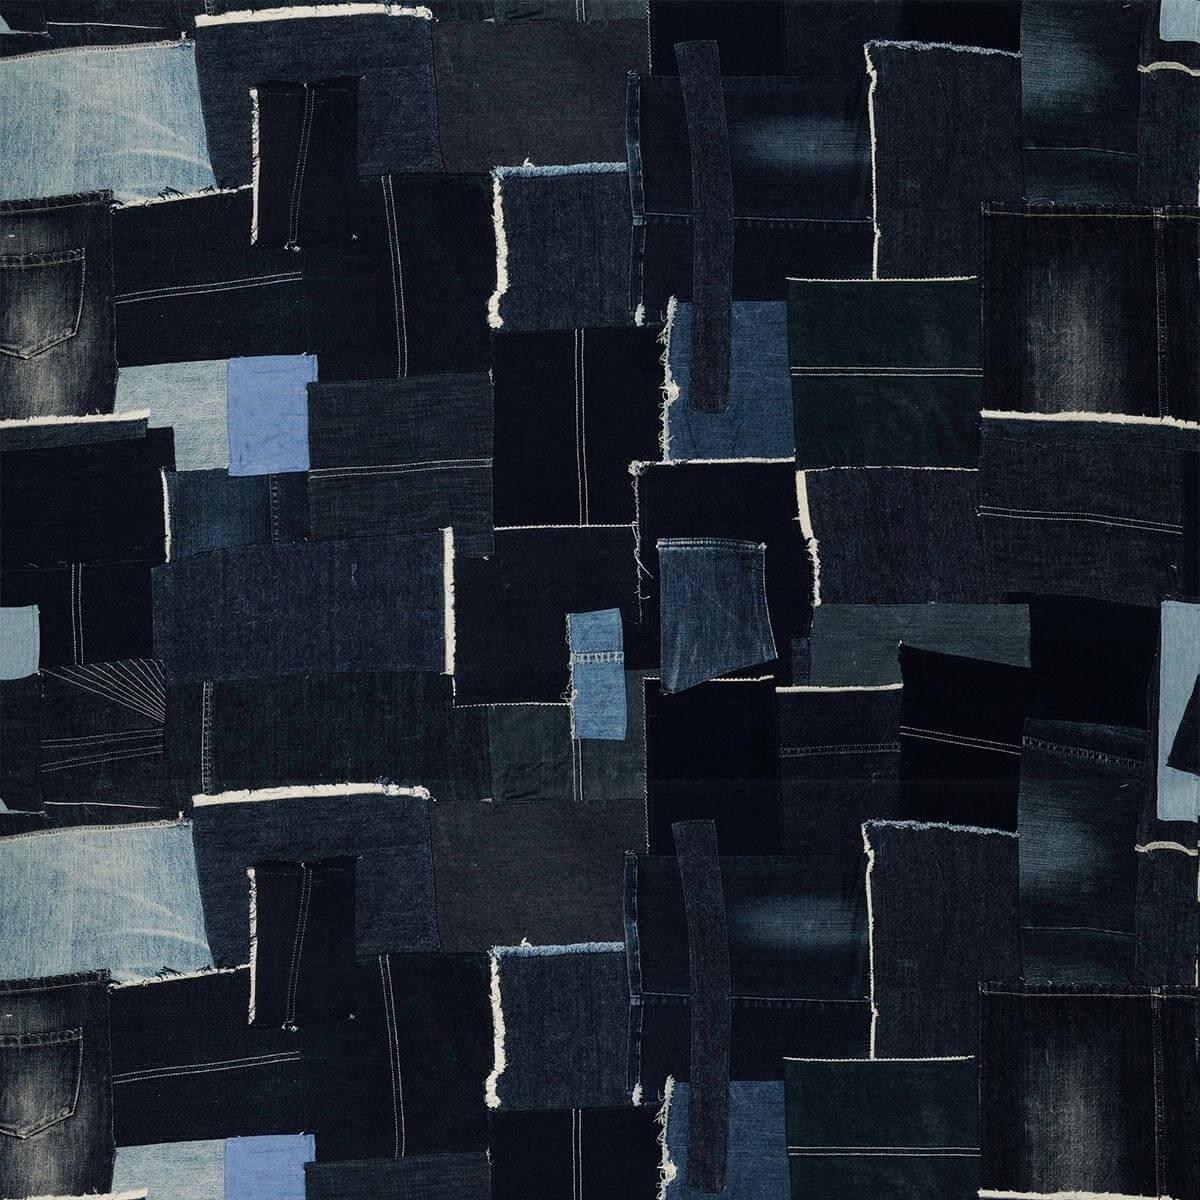 tissu patch jean paul gaultier. Black Bedroom Furniture Sets. Home Design Ideas